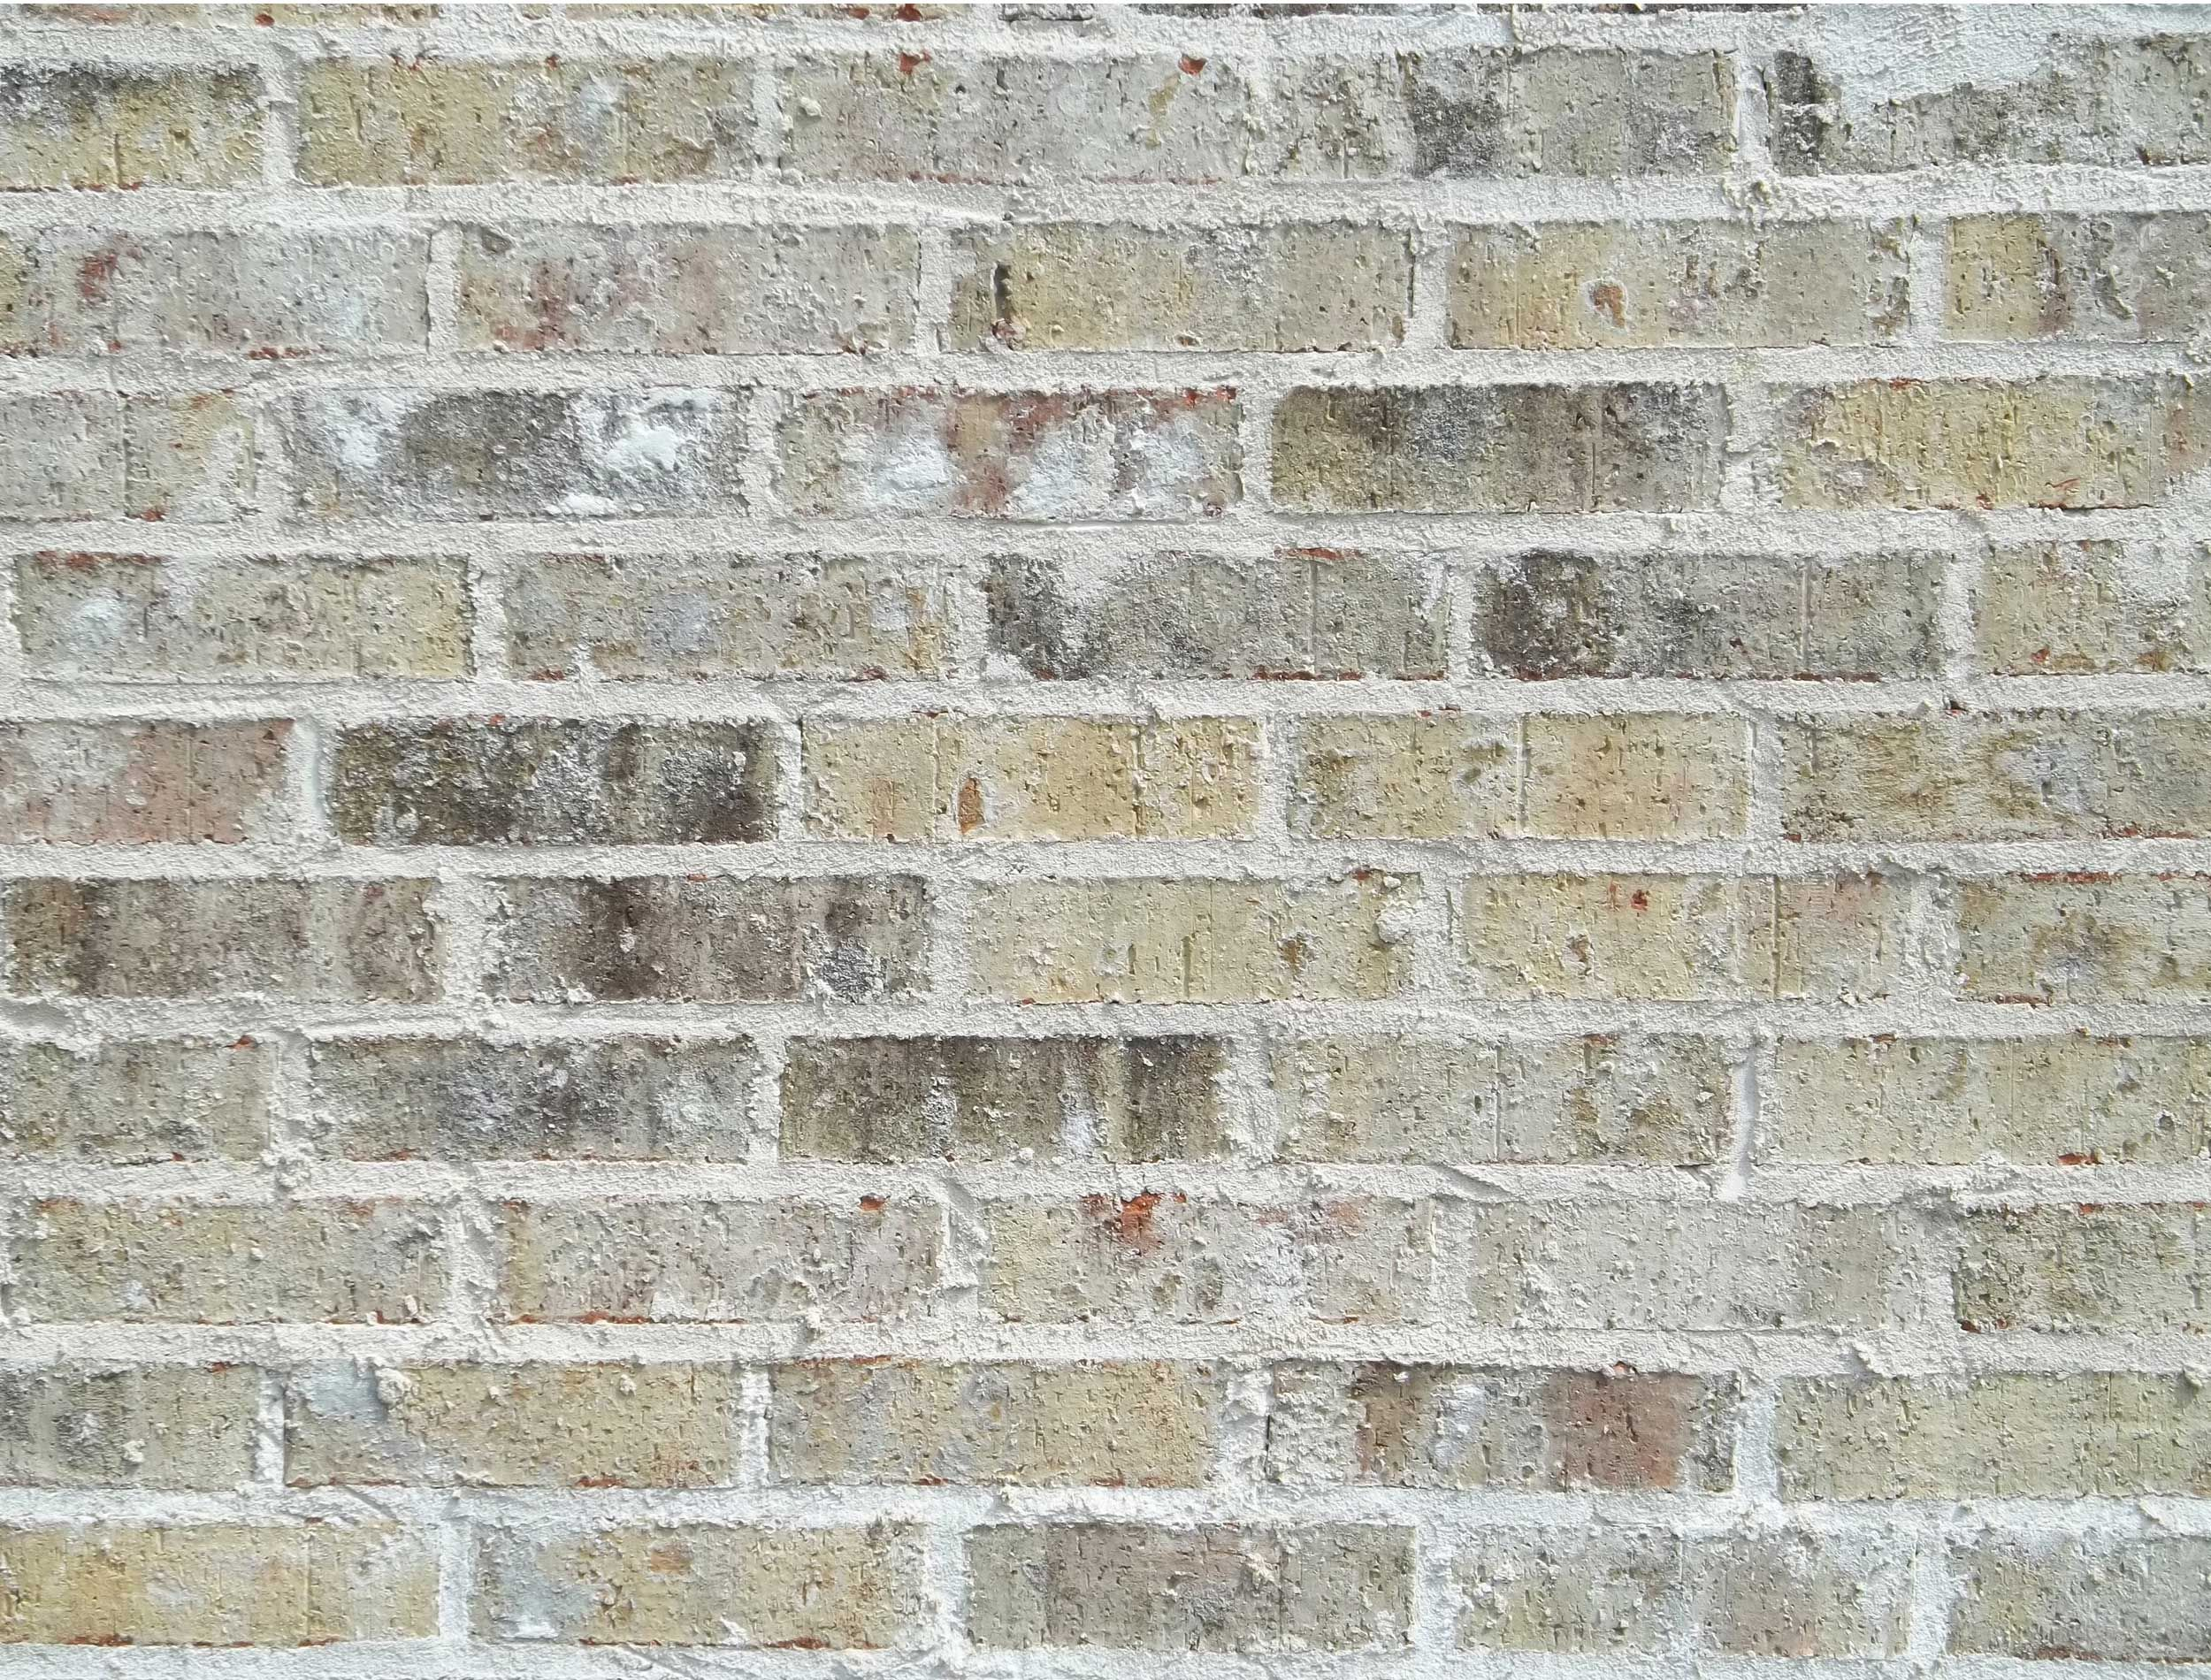 Meridian Mw Heritage Winslow Ks In 2019 Brick Wallpaper